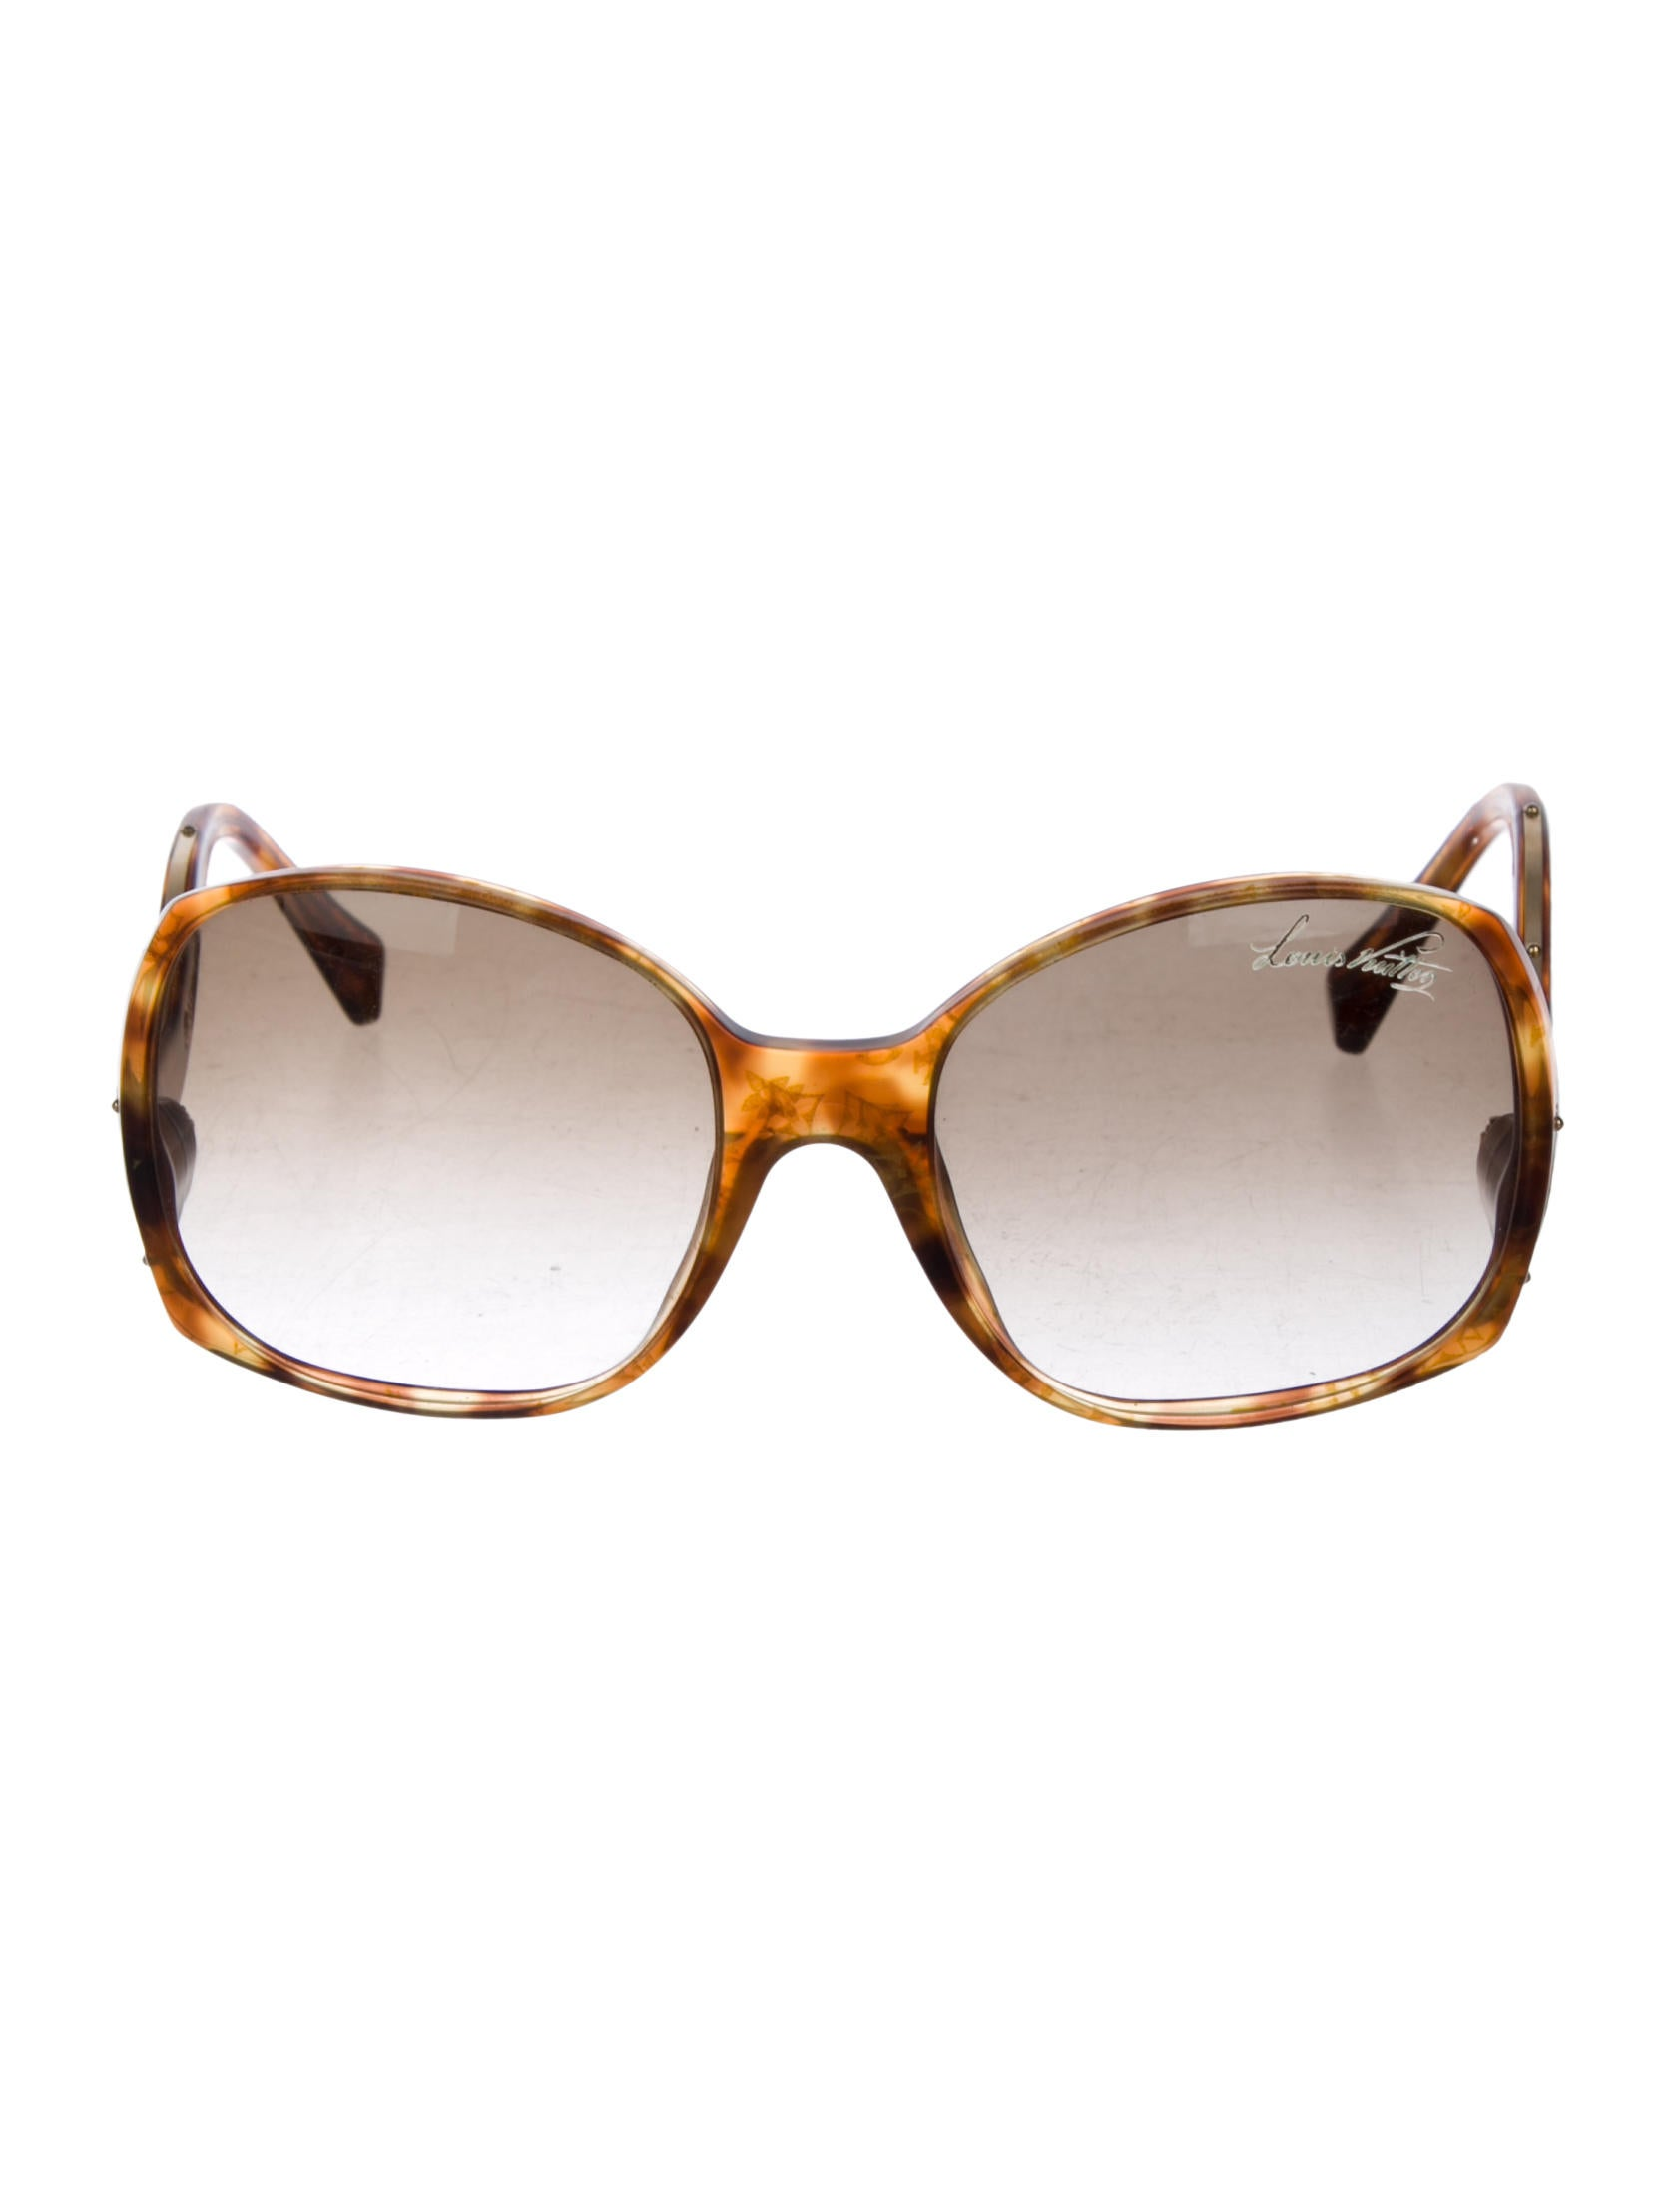 f820241d84e3 Louis Vuitton Gina Glitter Sunglasses - Accessories - LOU186721 ...